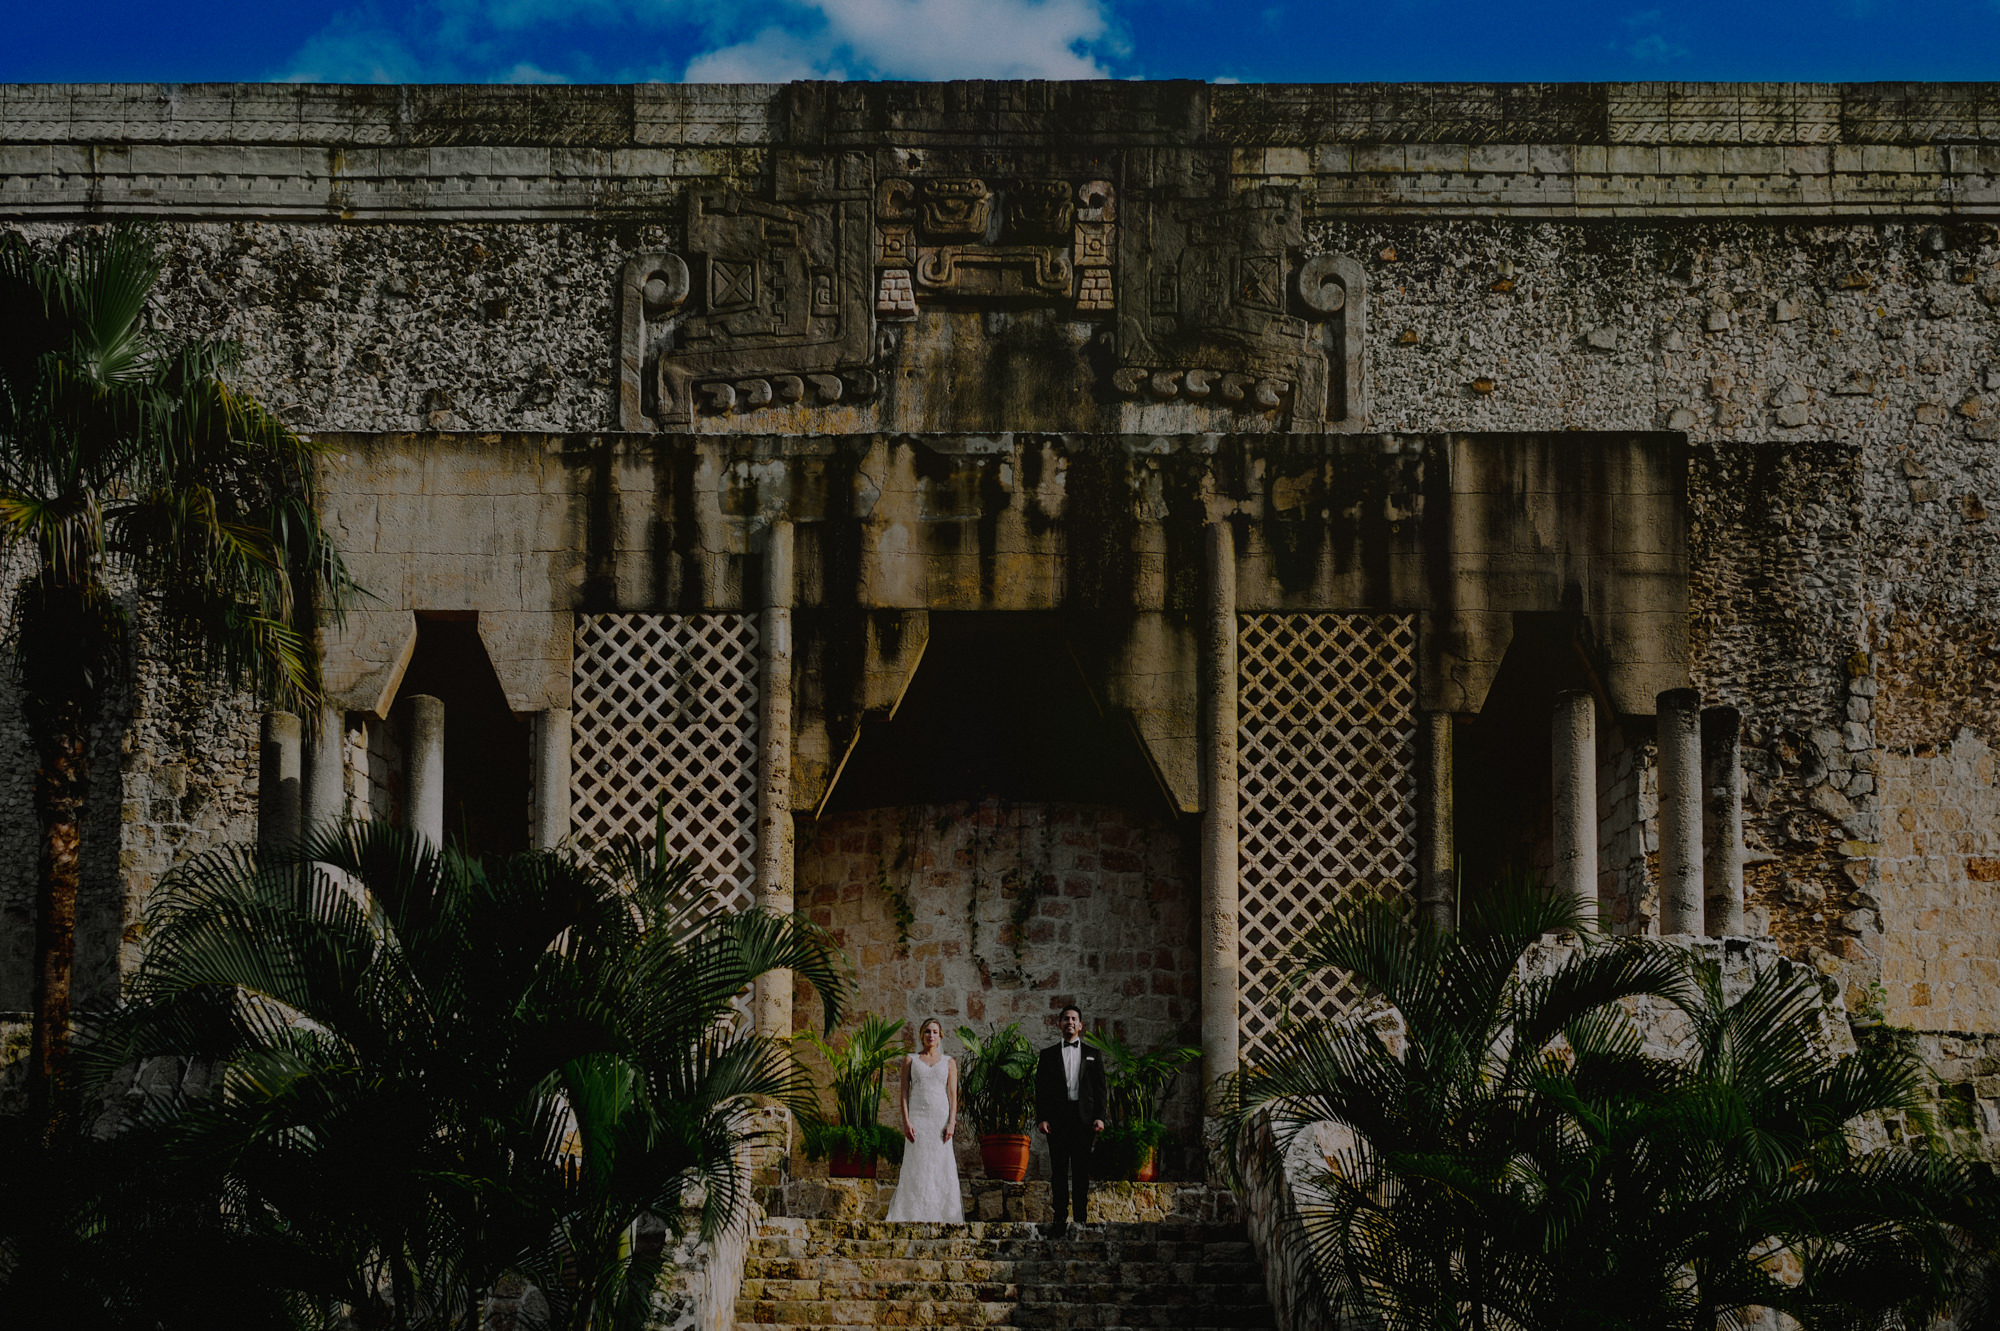 Wedding portrait at Mayan Ruins by Fer Juaristi